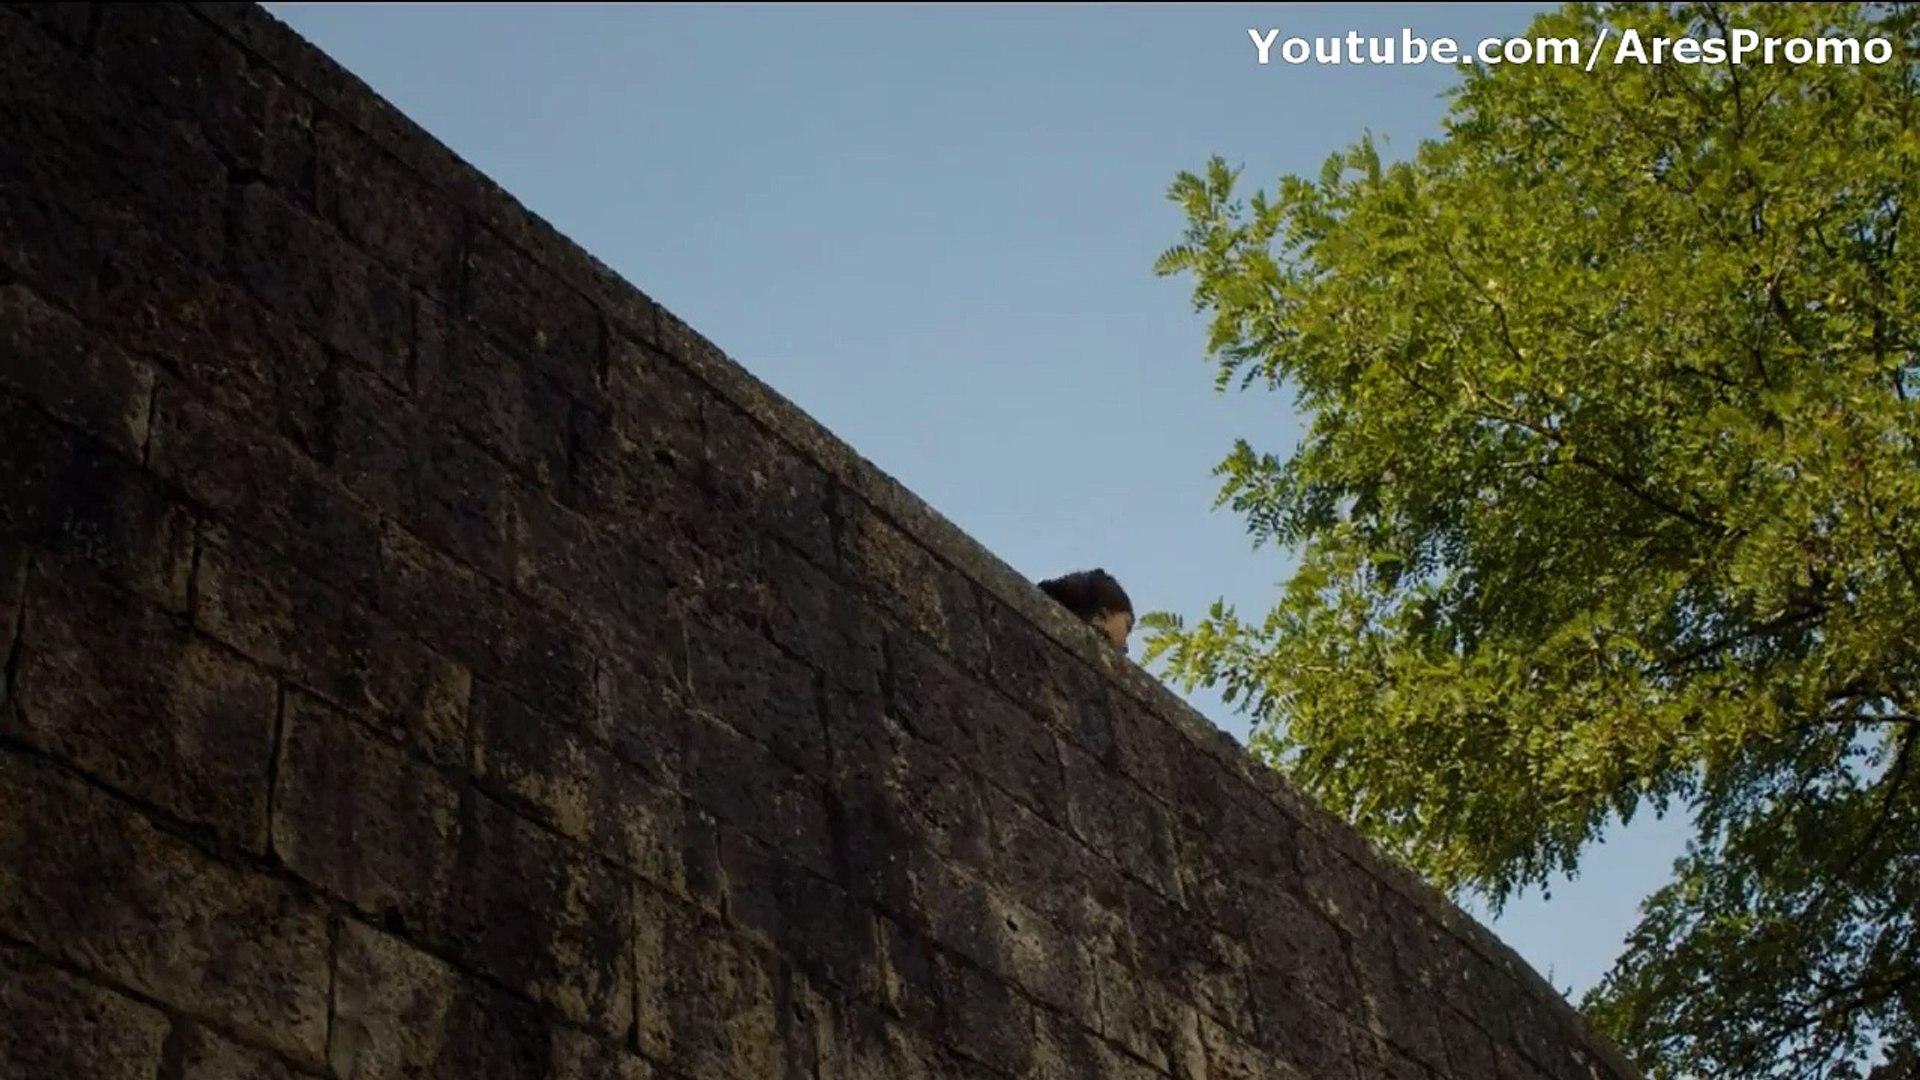 Game Of Thrones 6x07 Ending Scene Game Of Thrones Season 6 Episode 7 [HD]